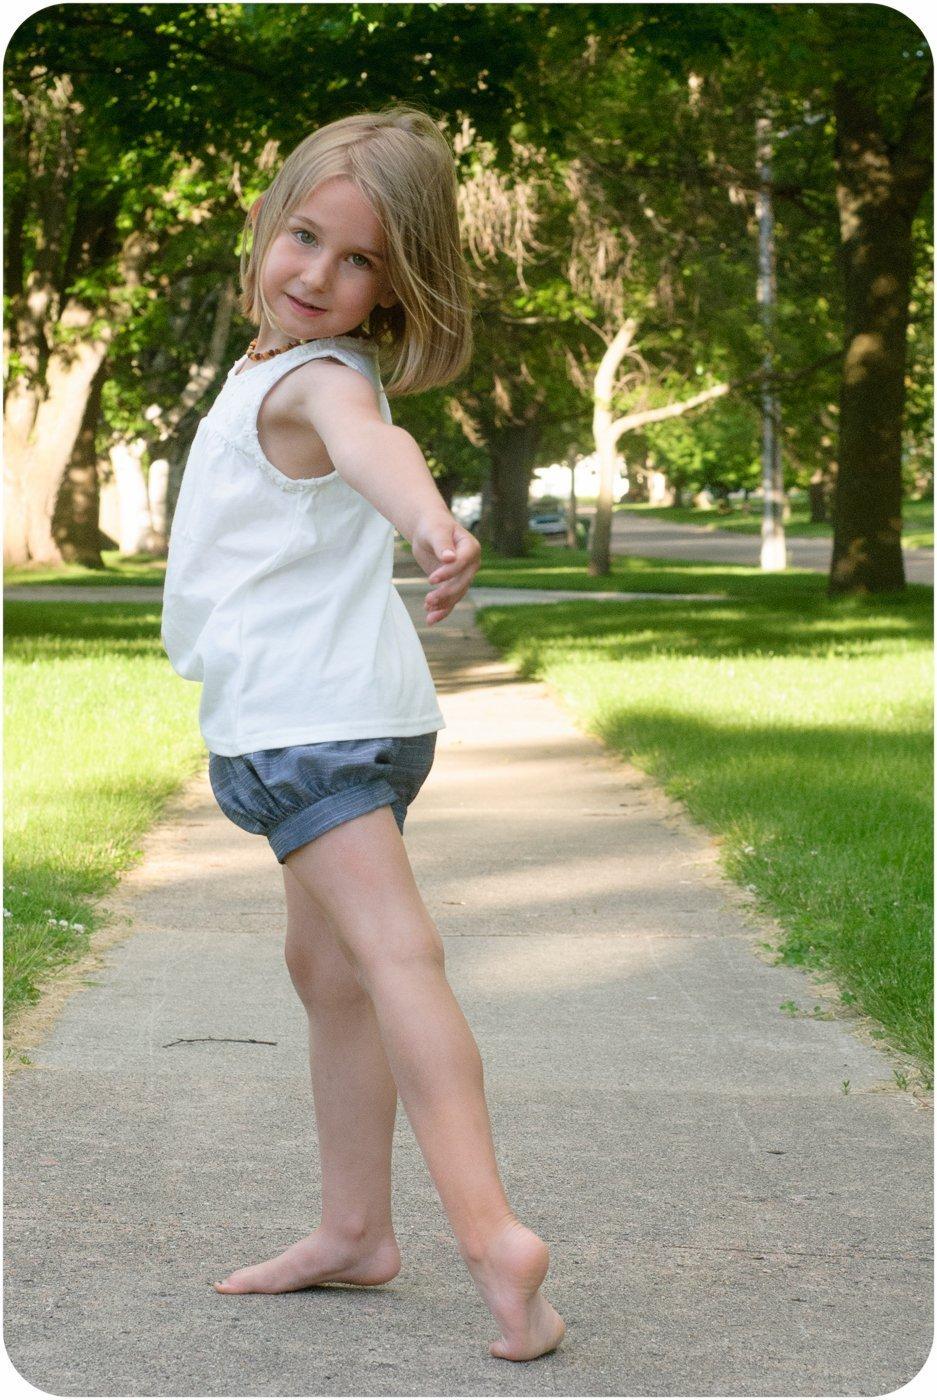 Summer Vine Preteen Girl Sitting Hand Straightens Hair